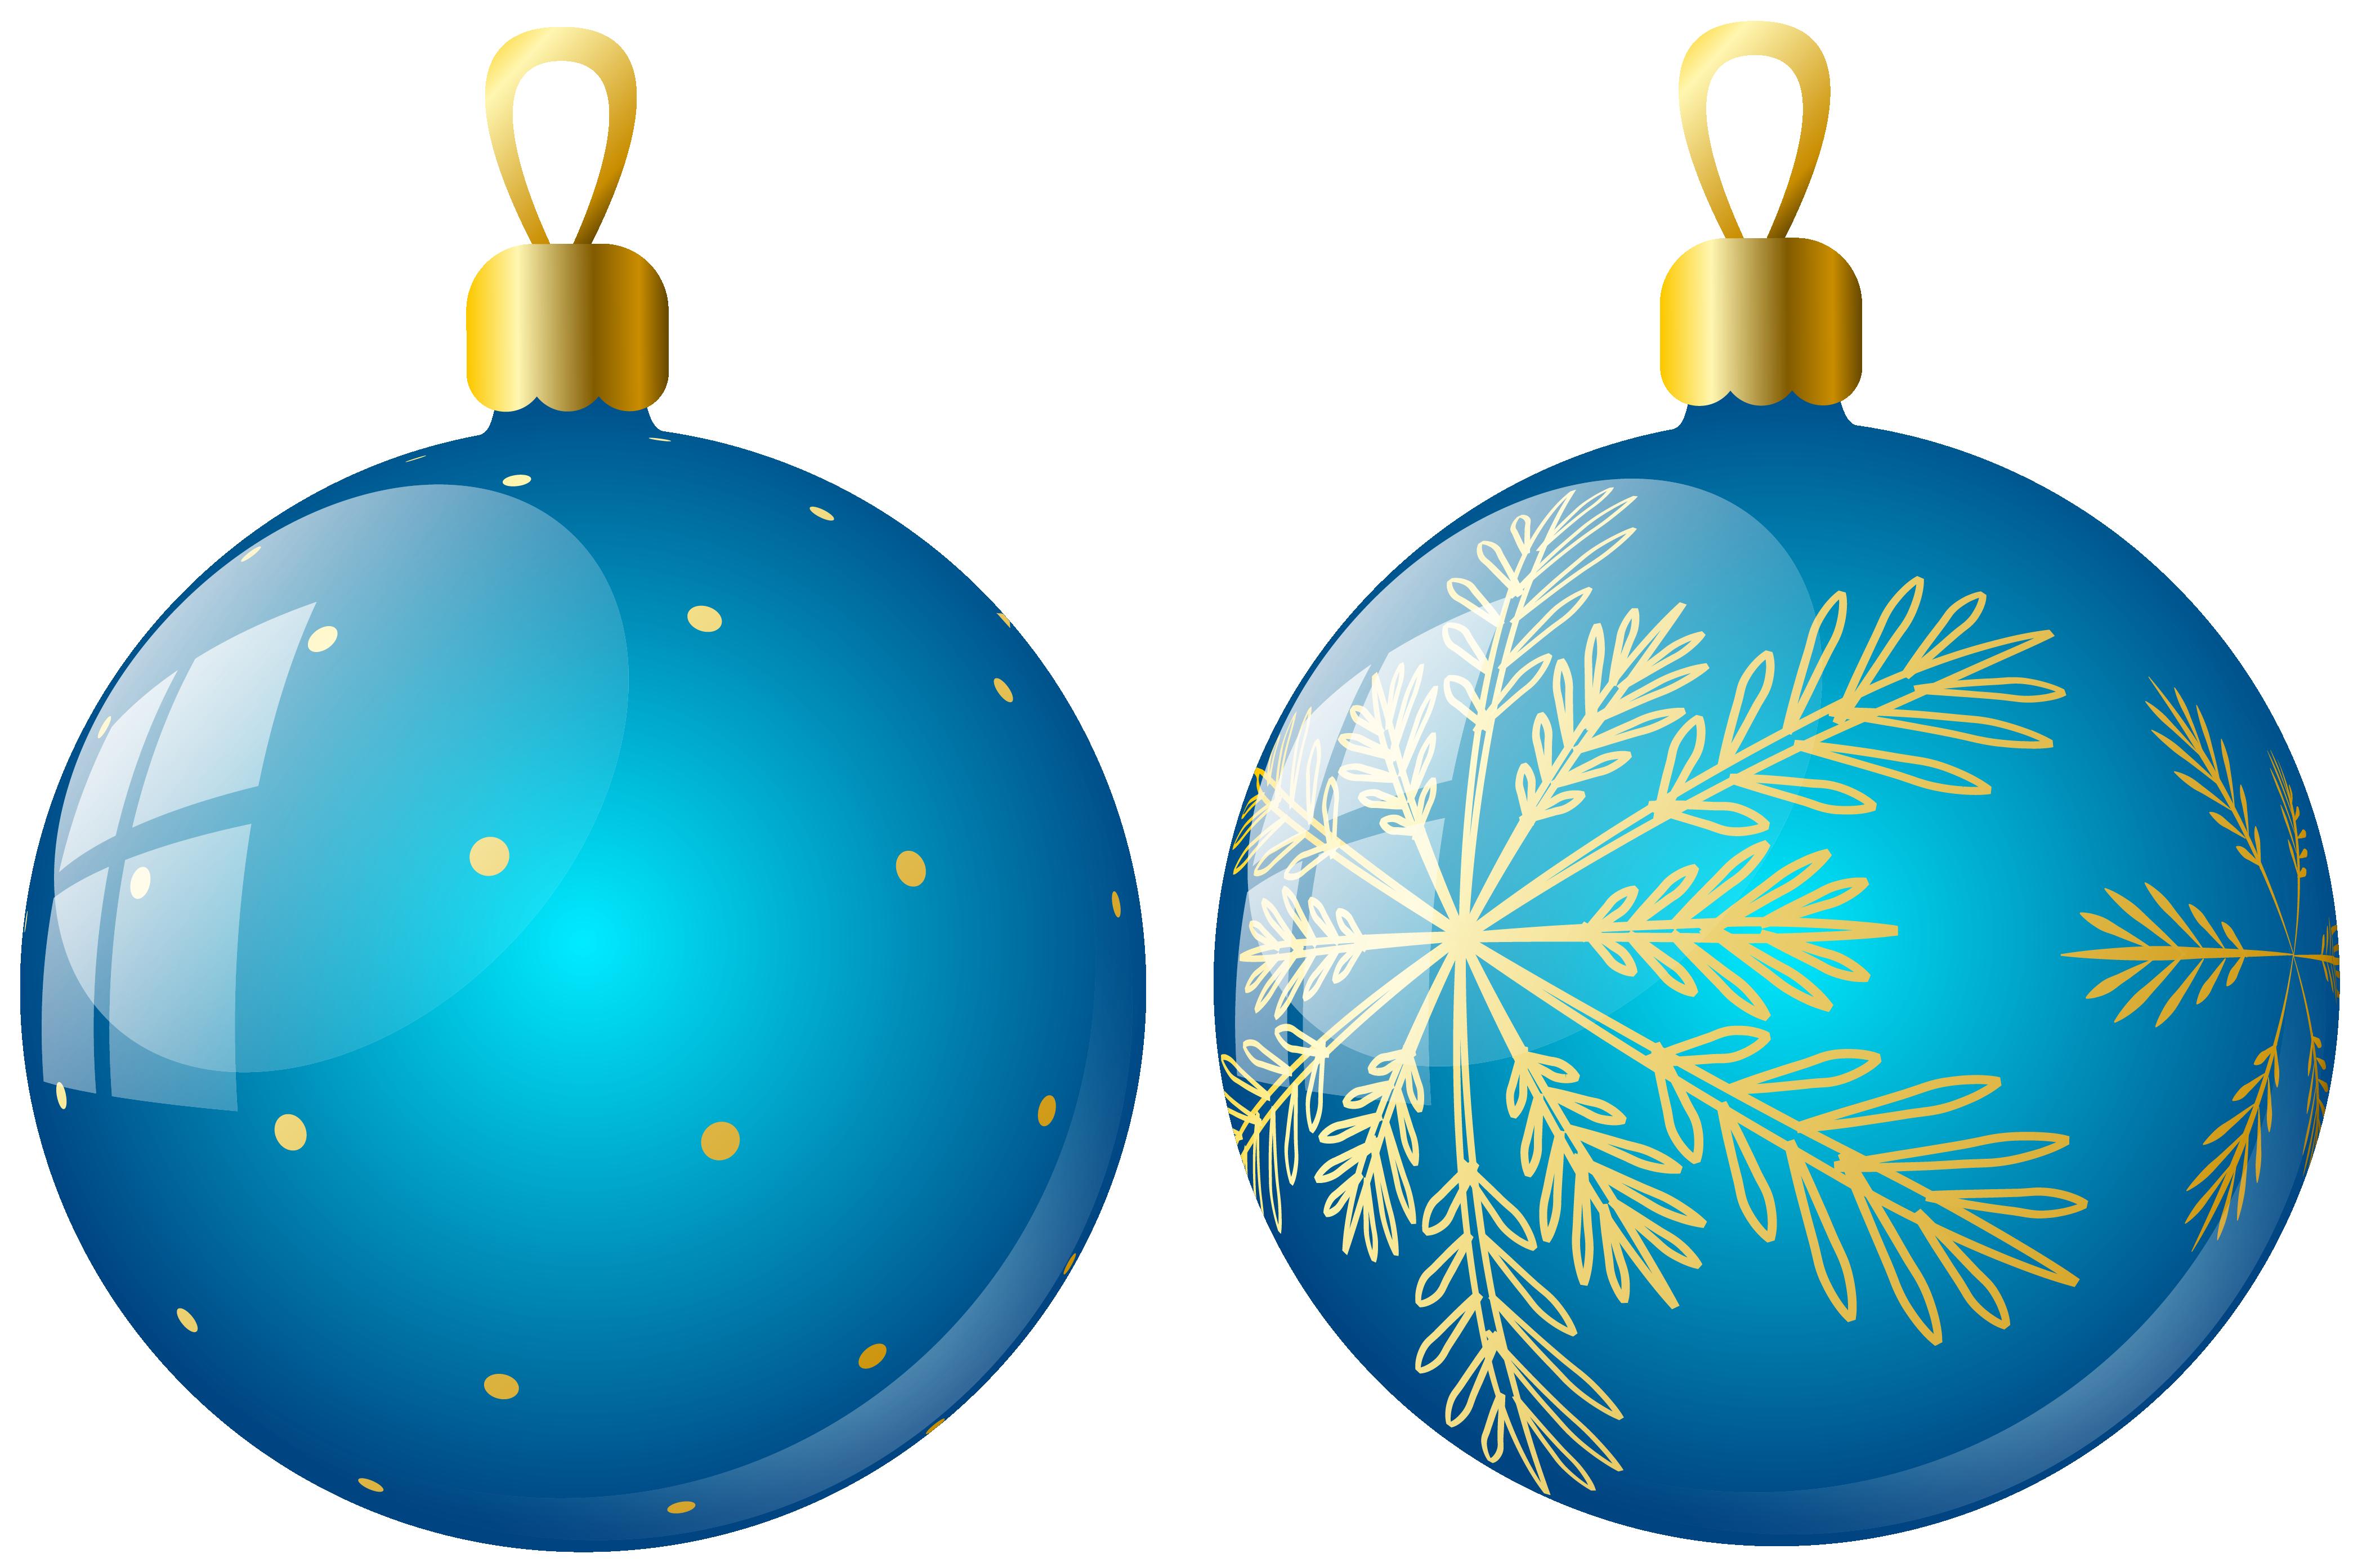 Ornaments clipart. Transparent two blue christmas